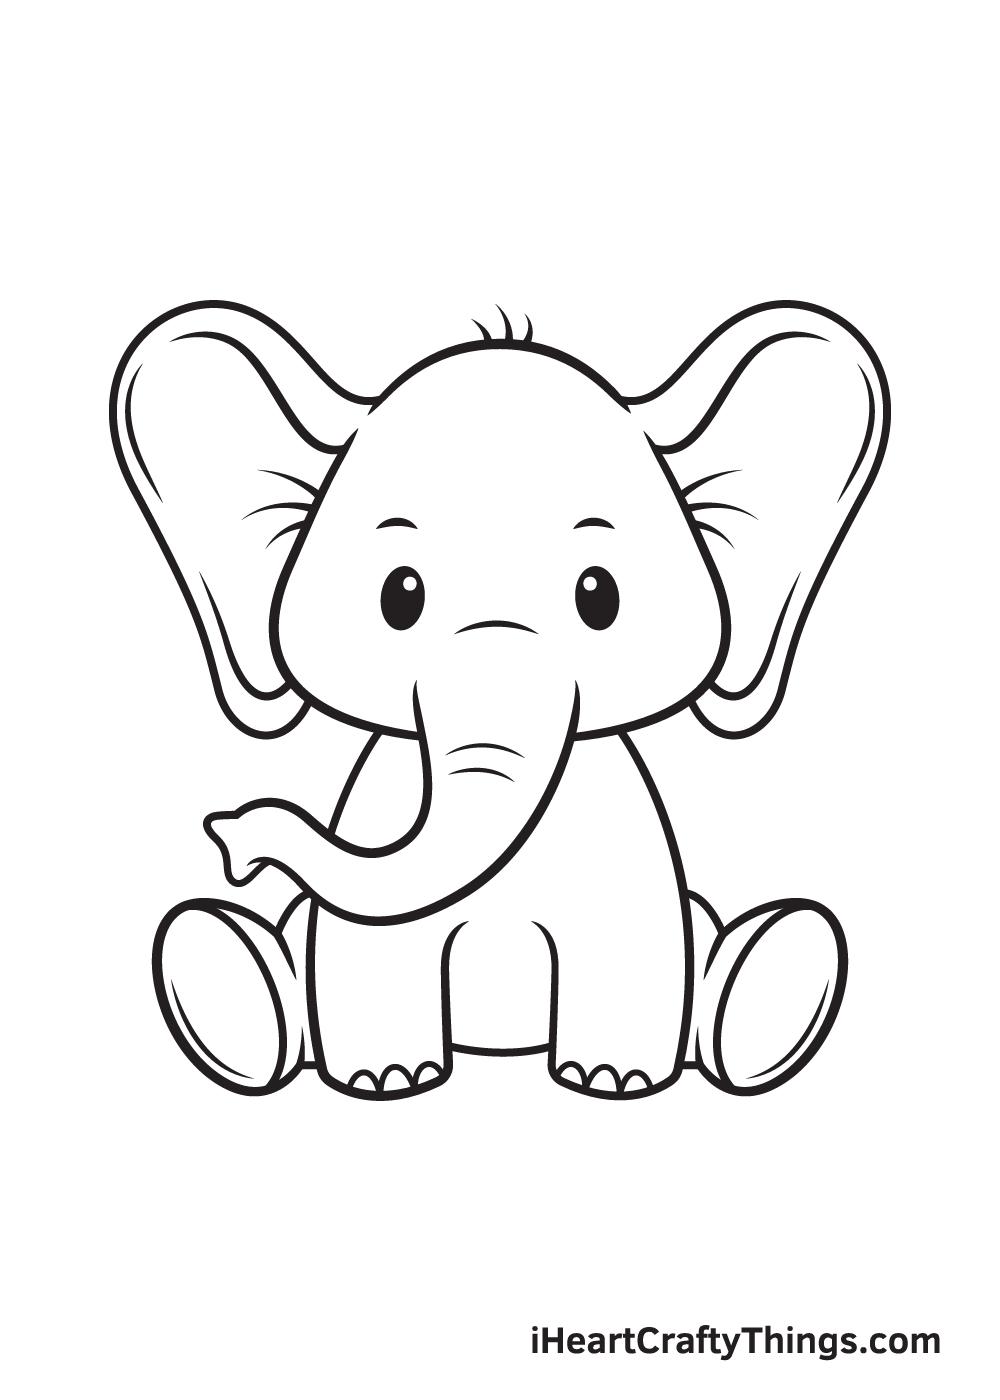 Elephant Drawing – Step 9